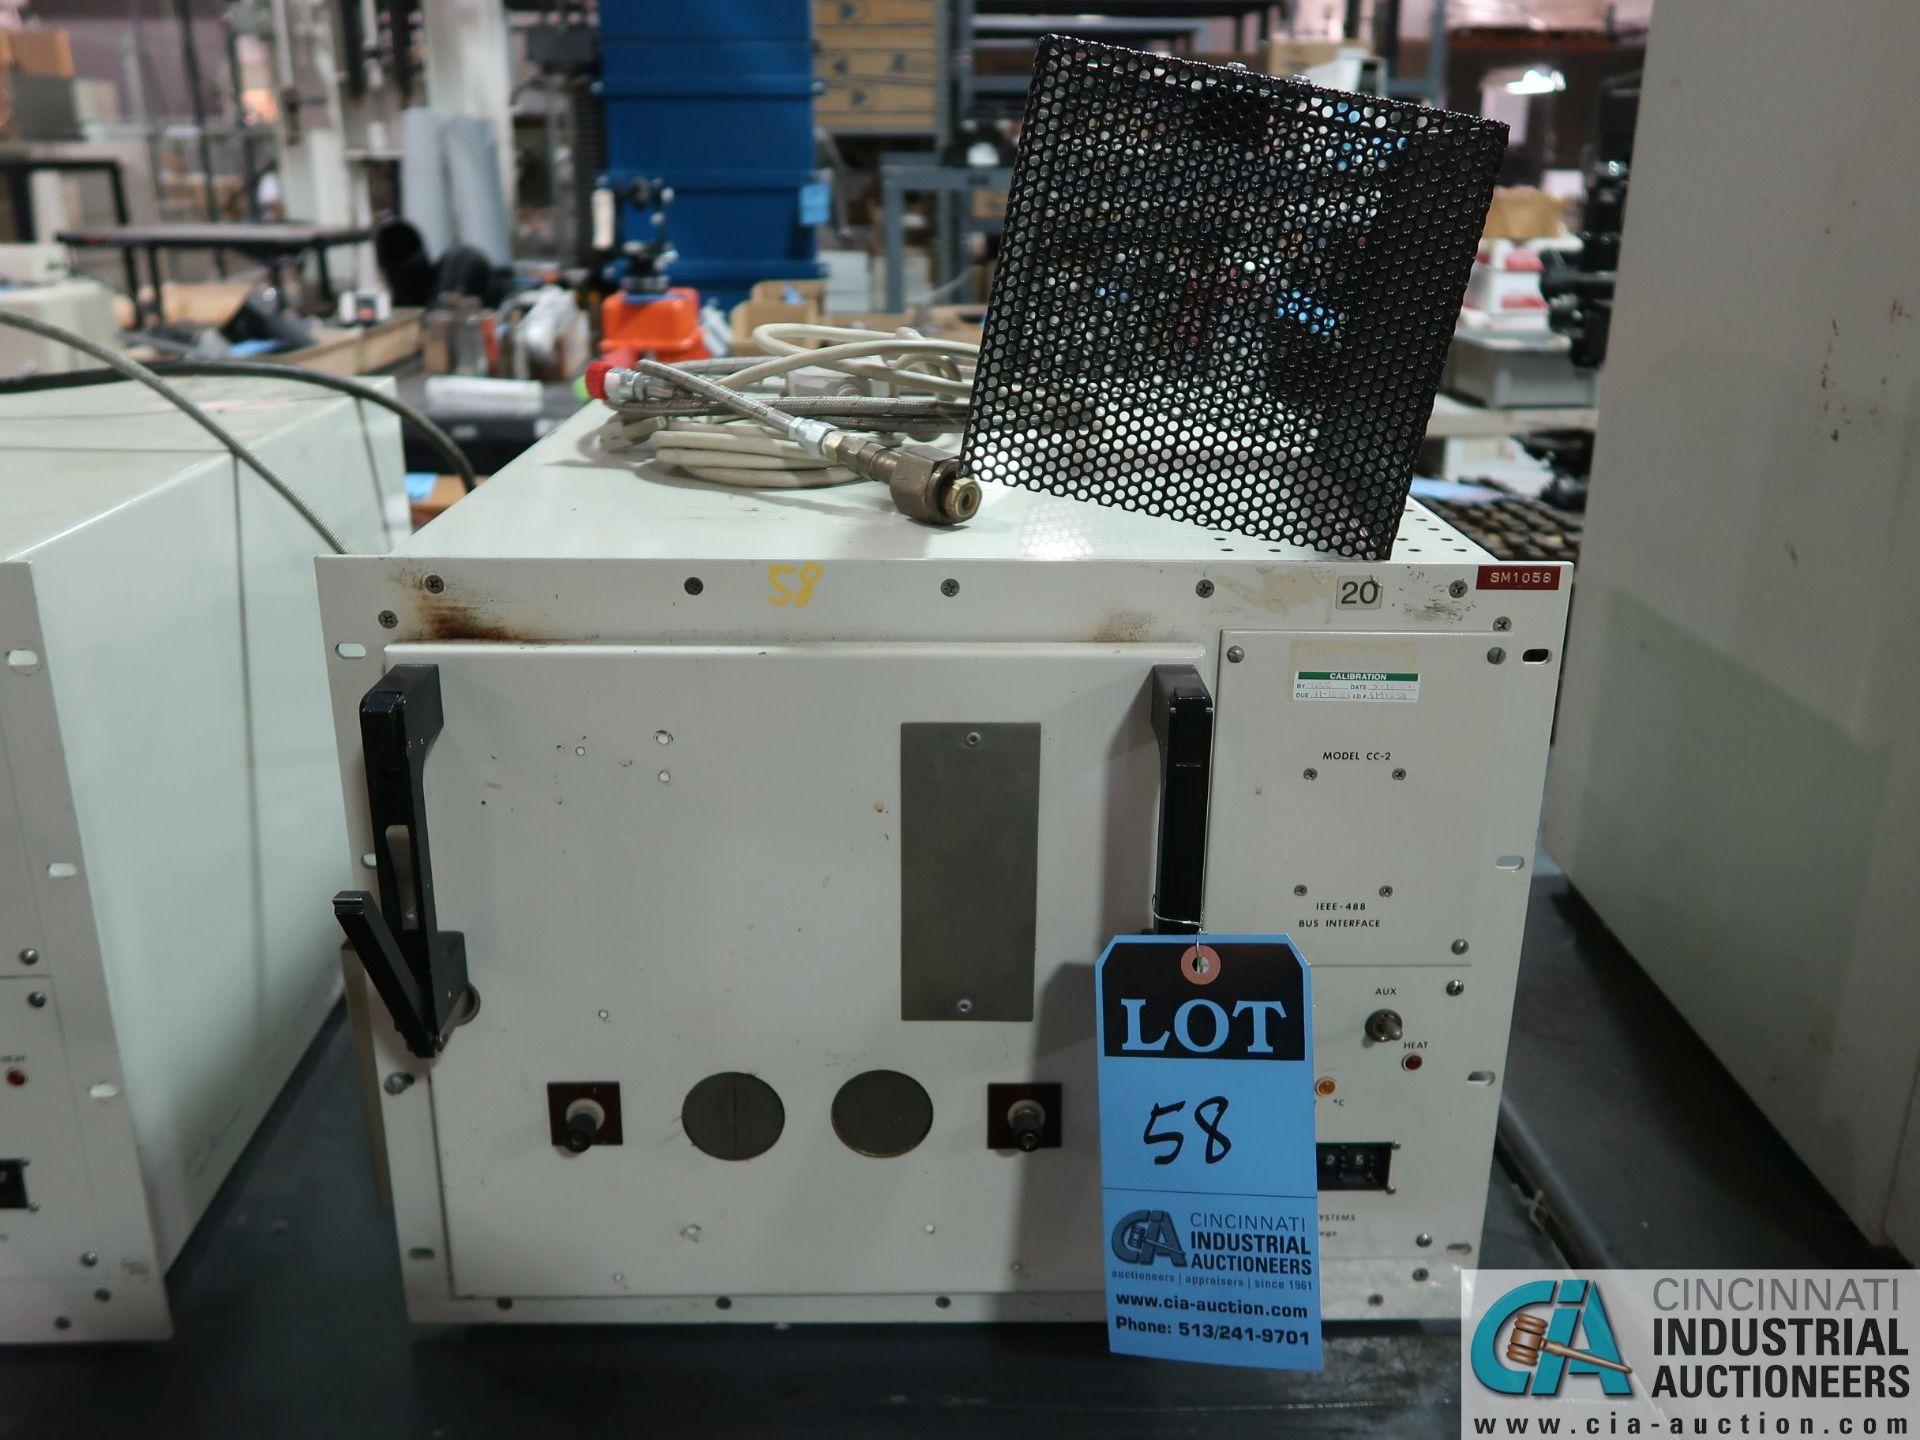 "Lot 58 - SIGMA SYSTEMS MODEL 18RCC TEST CHAMBER; S/N 785, 120 VOLT, CHAMBER DIMENSIONS: 10"" LR X 10"" FB X 10"""